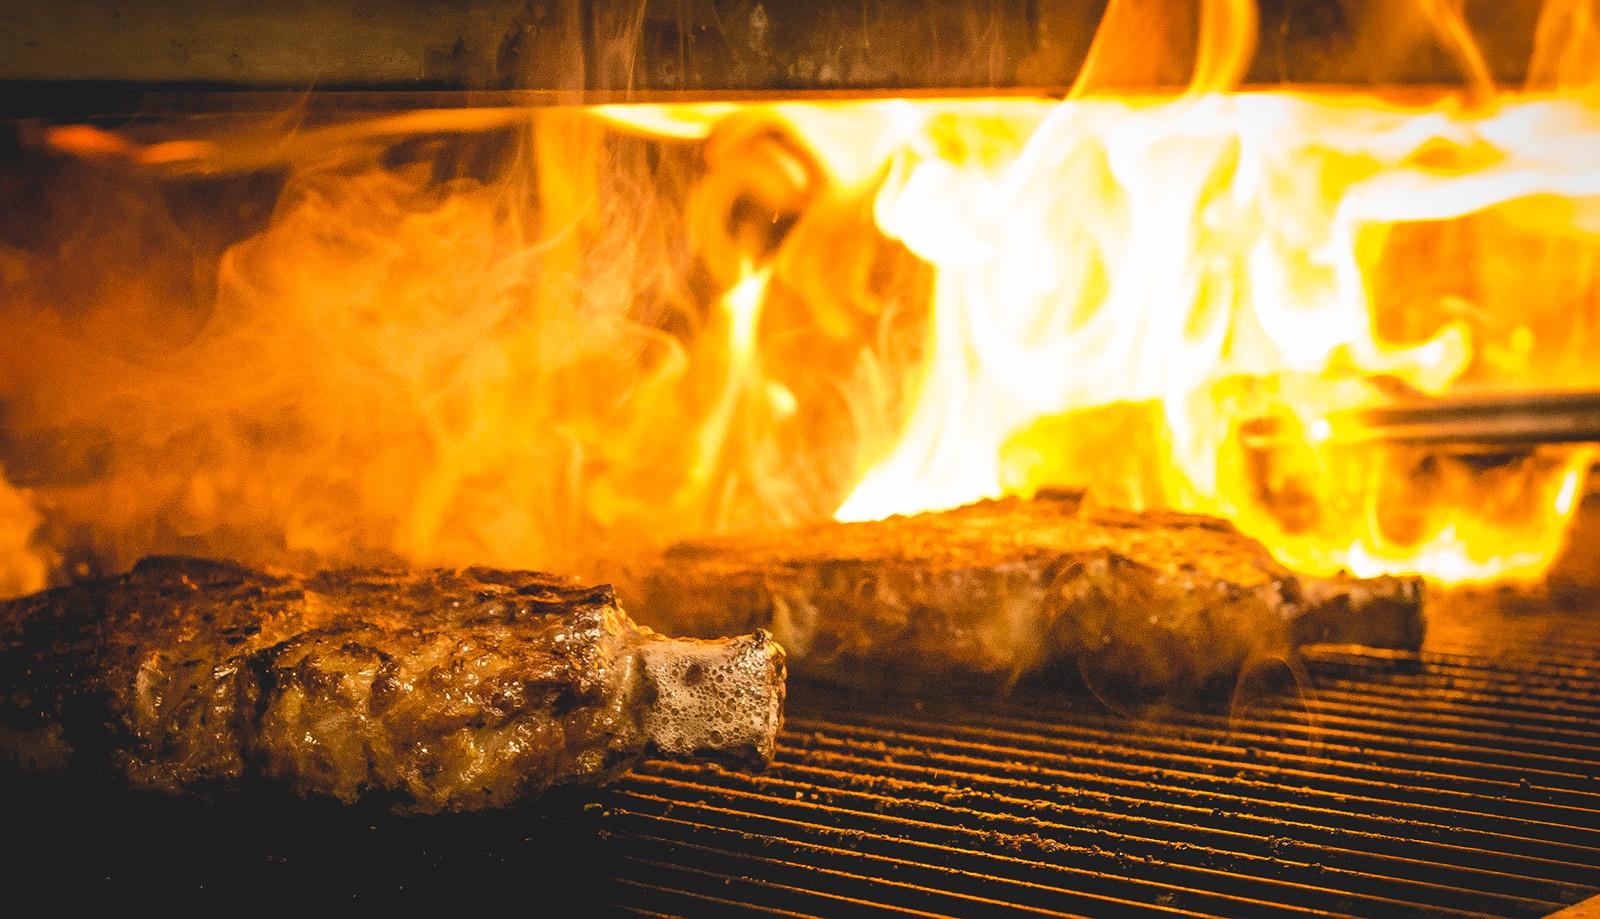 LV Flame Steaks